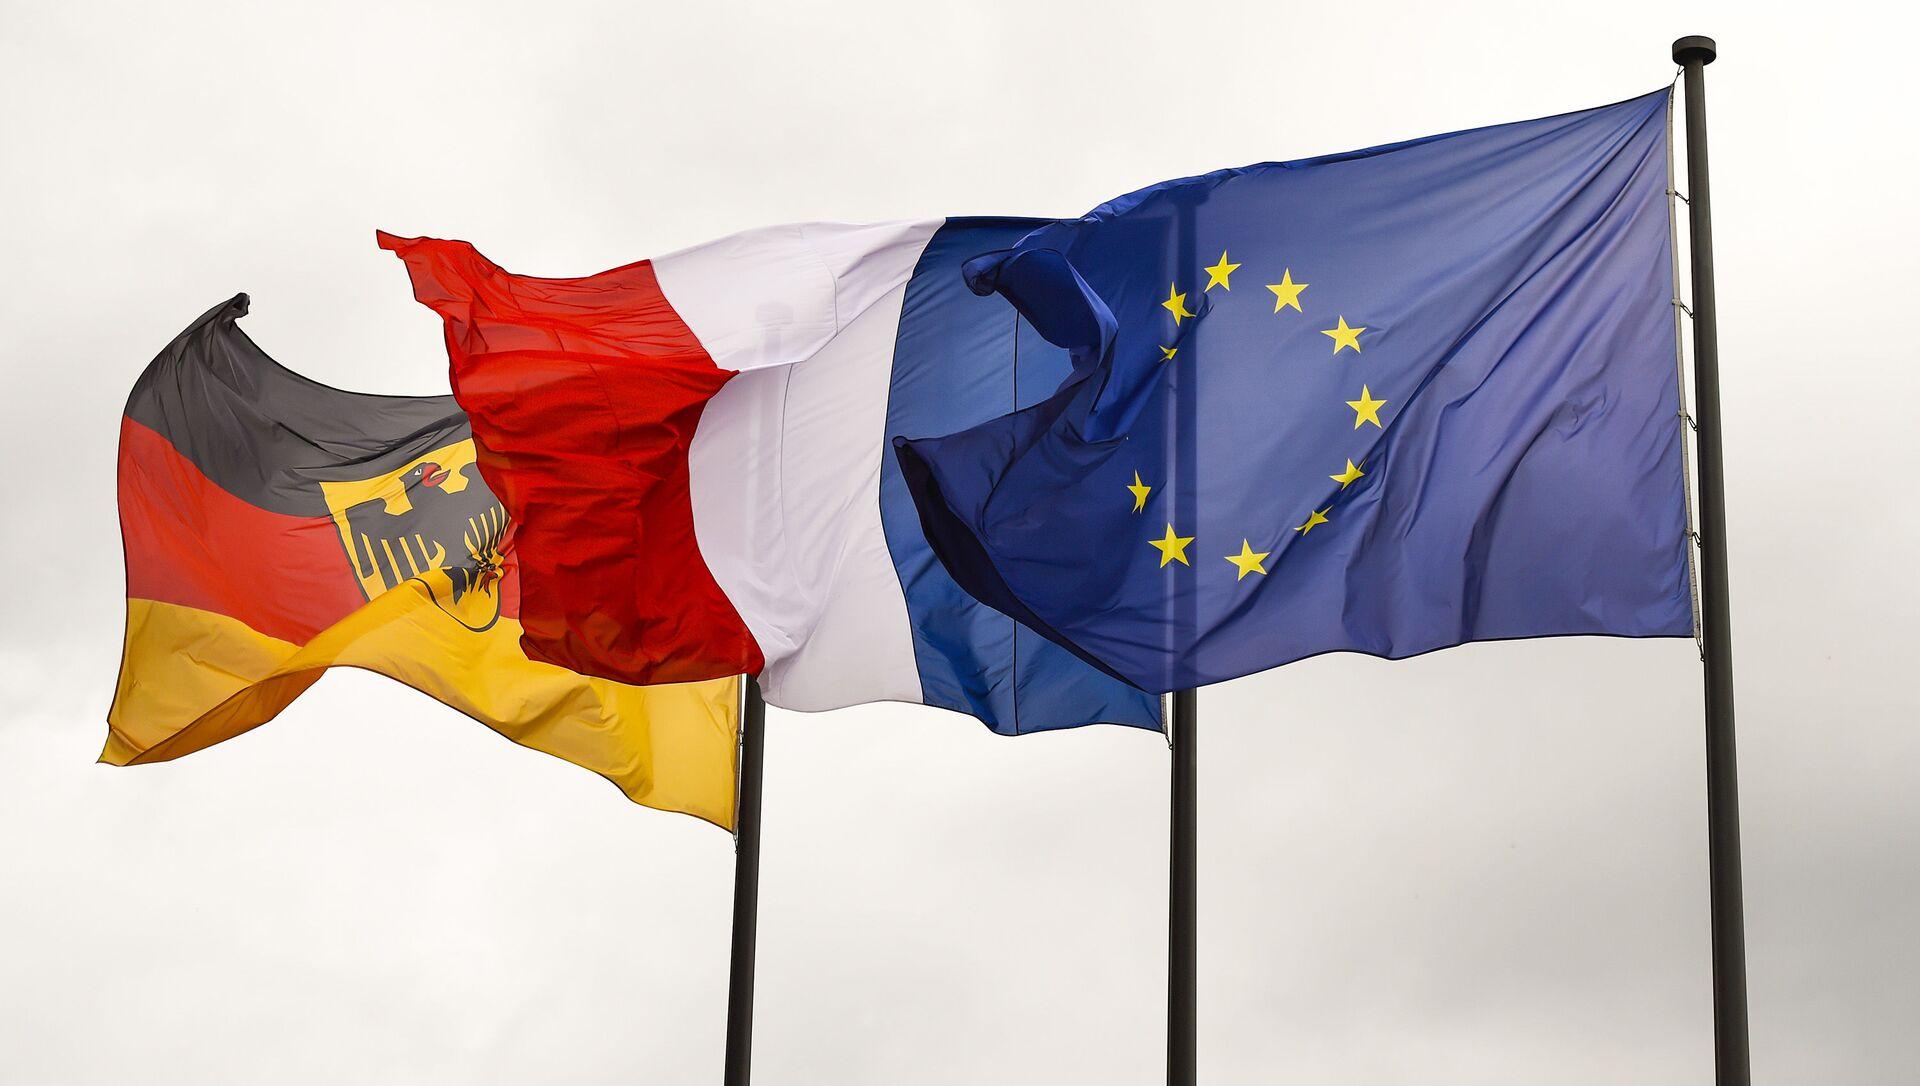 Флаги Германии, Франции и Евросоюза - Sputnik Việt Nam, 1920, 20.09.2021